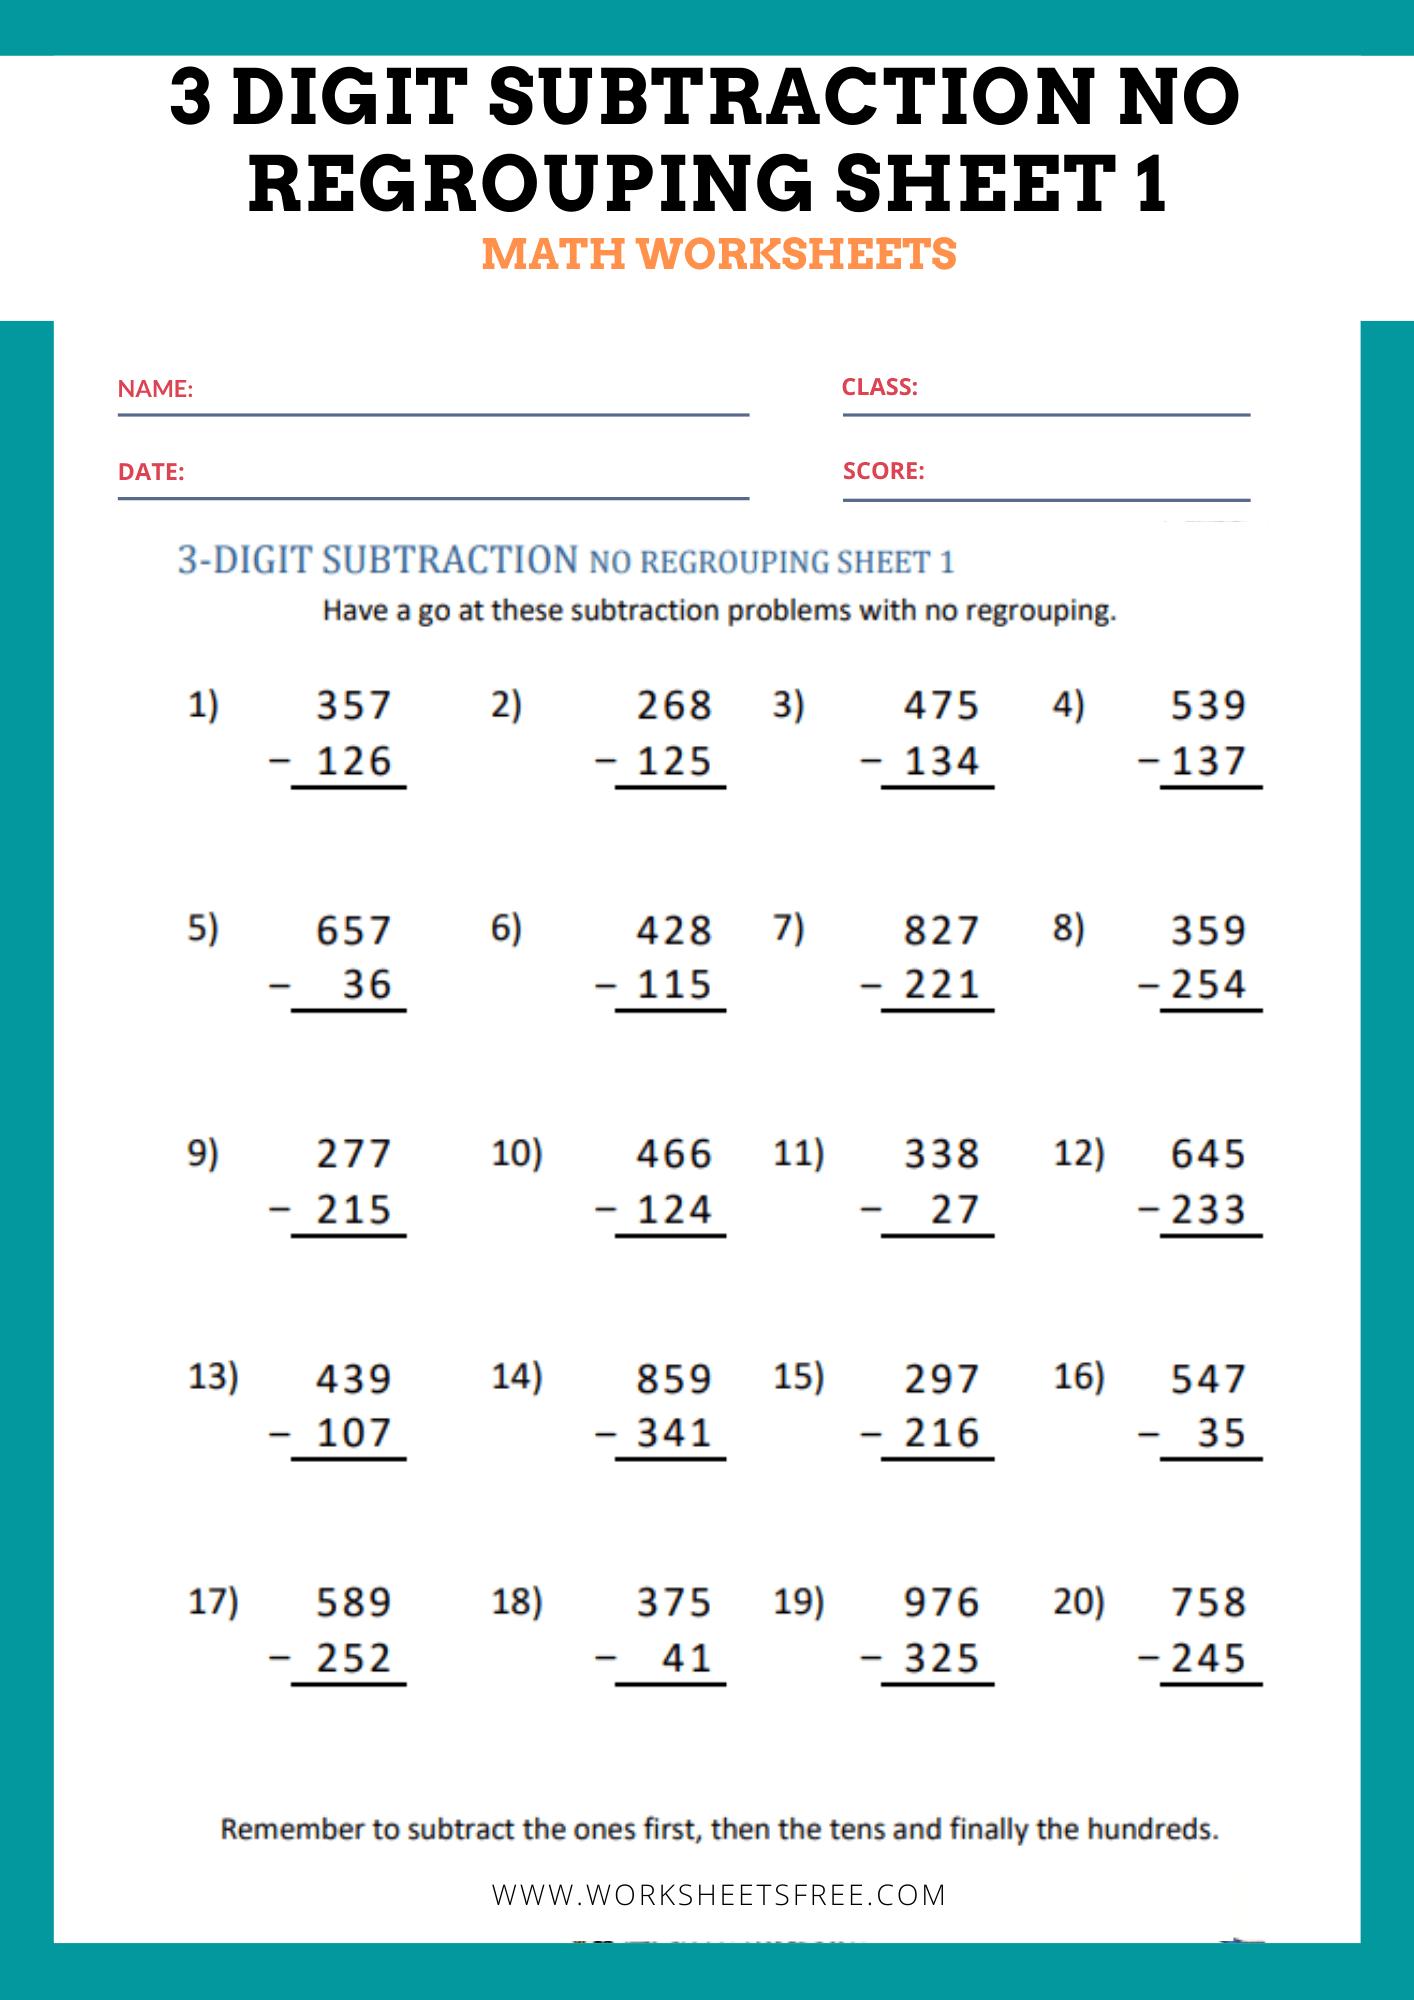 3 Digit Subtraction No Regrouping Sheet 1